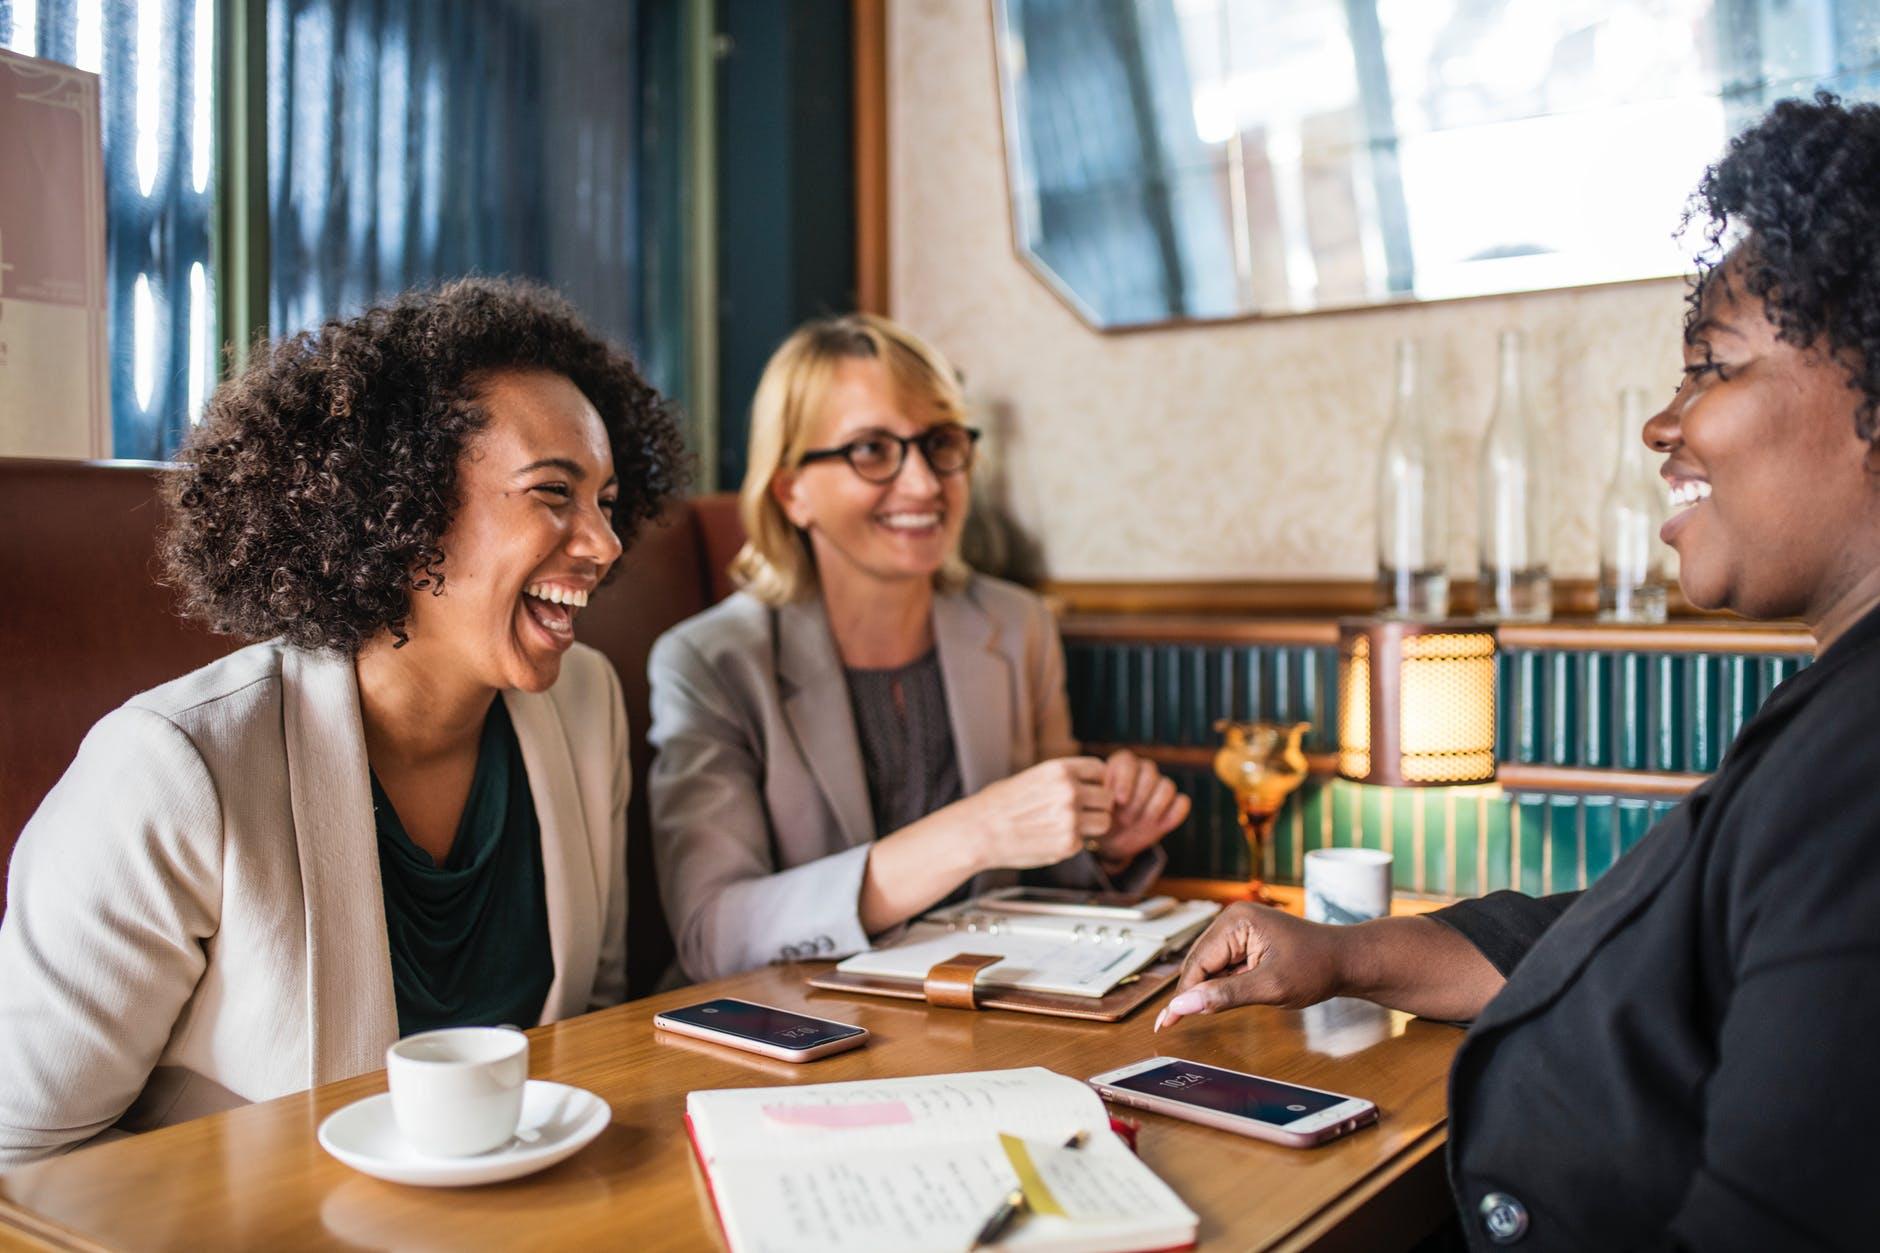 three woman sitting smiling inside room